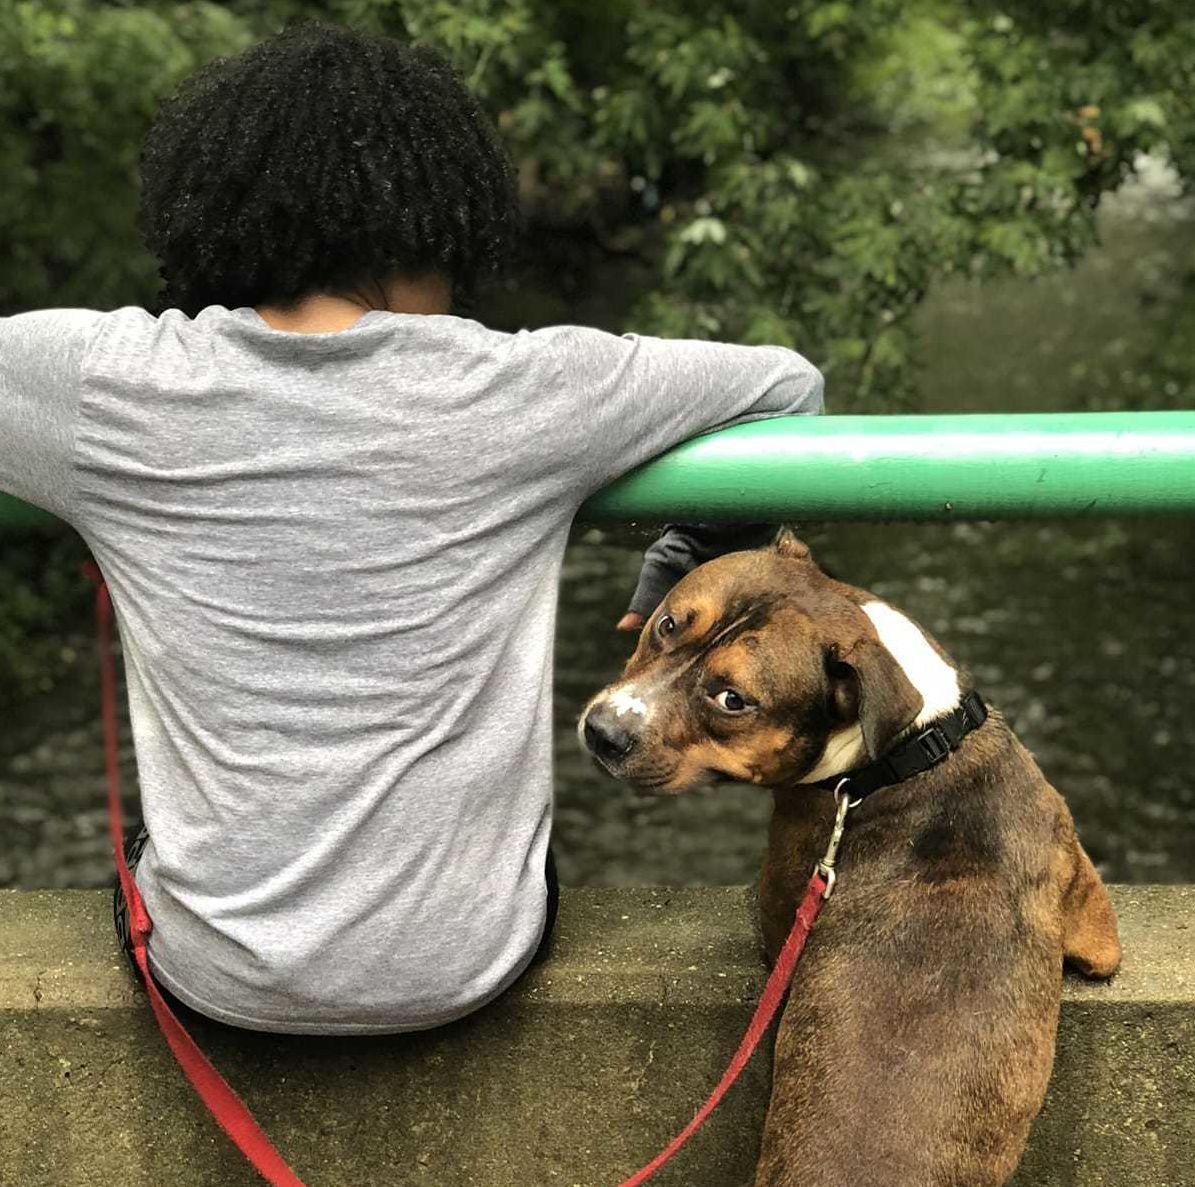 A photo of Tamara facing away from the camera with an adorable dog.